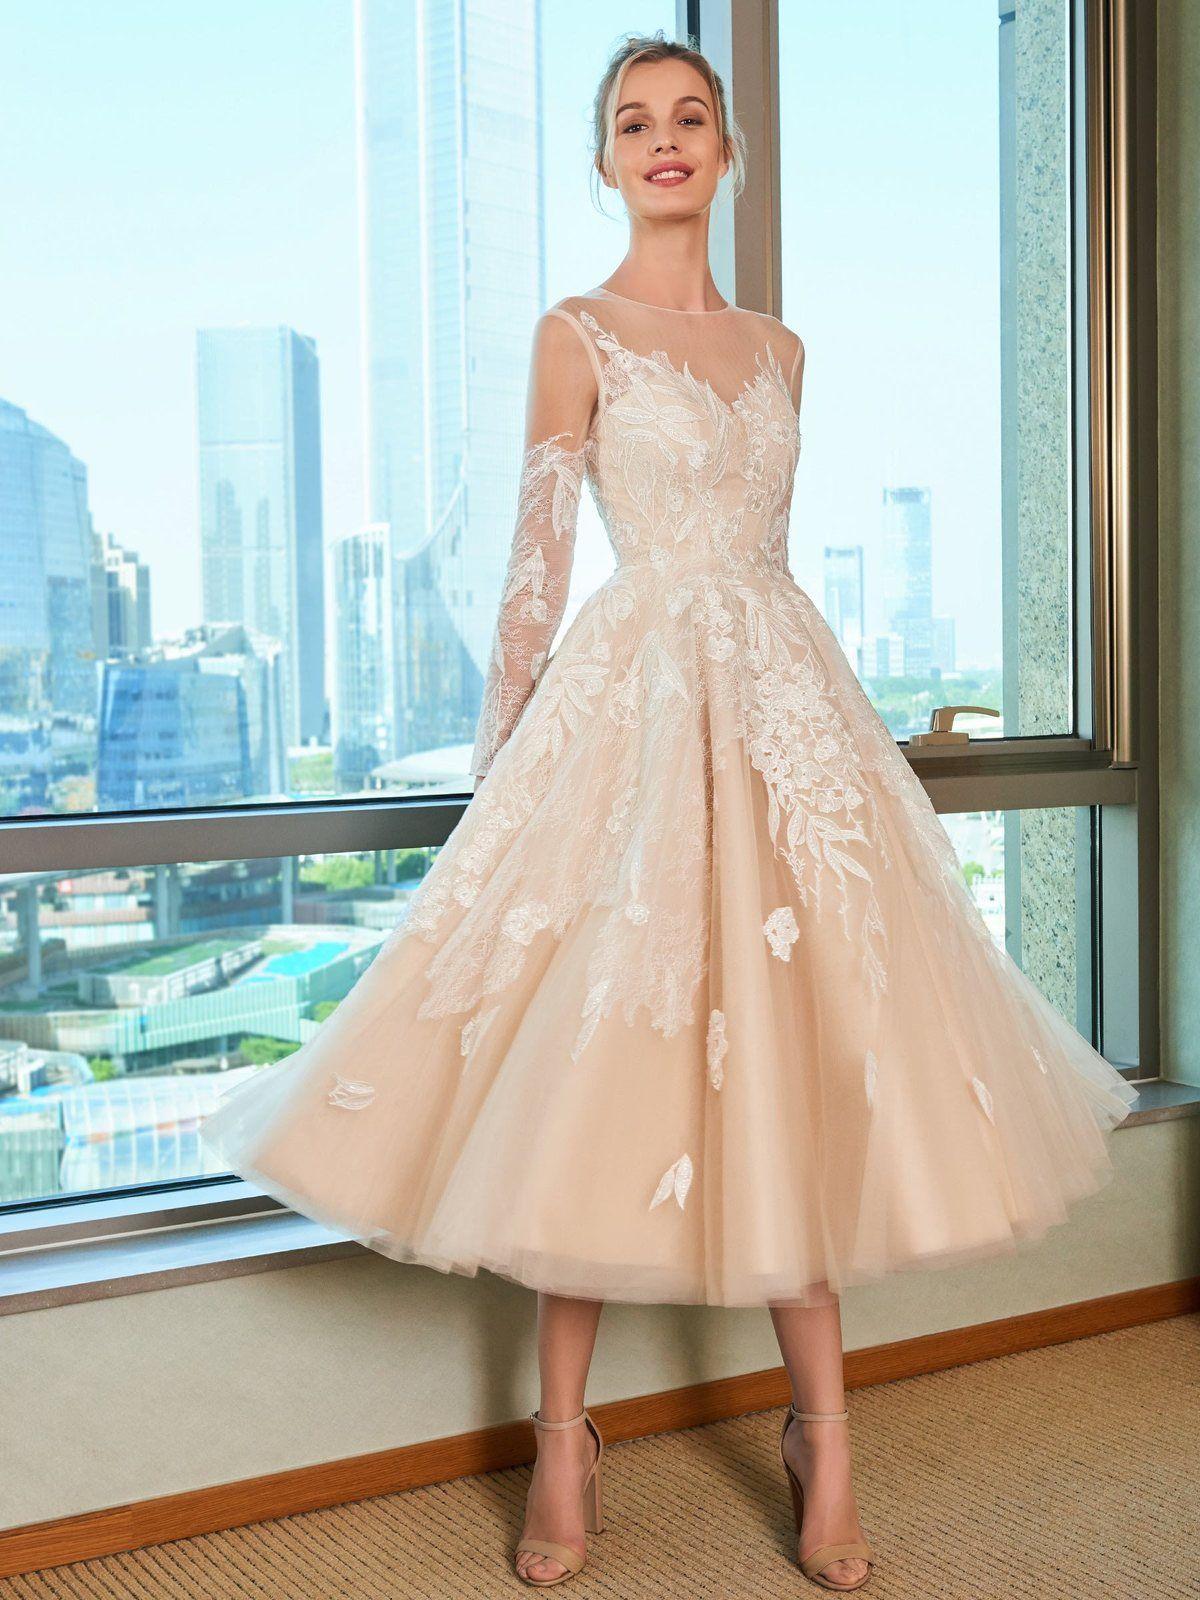 Material Tulle Body Shape All Sizes Silhouette A Line Hemline Tea Length Neckl Tea Length Wedding Dress Tea Length Beach Wedding Dresses Tea Length Dresses [ 1600 x 1200 Pixel ]